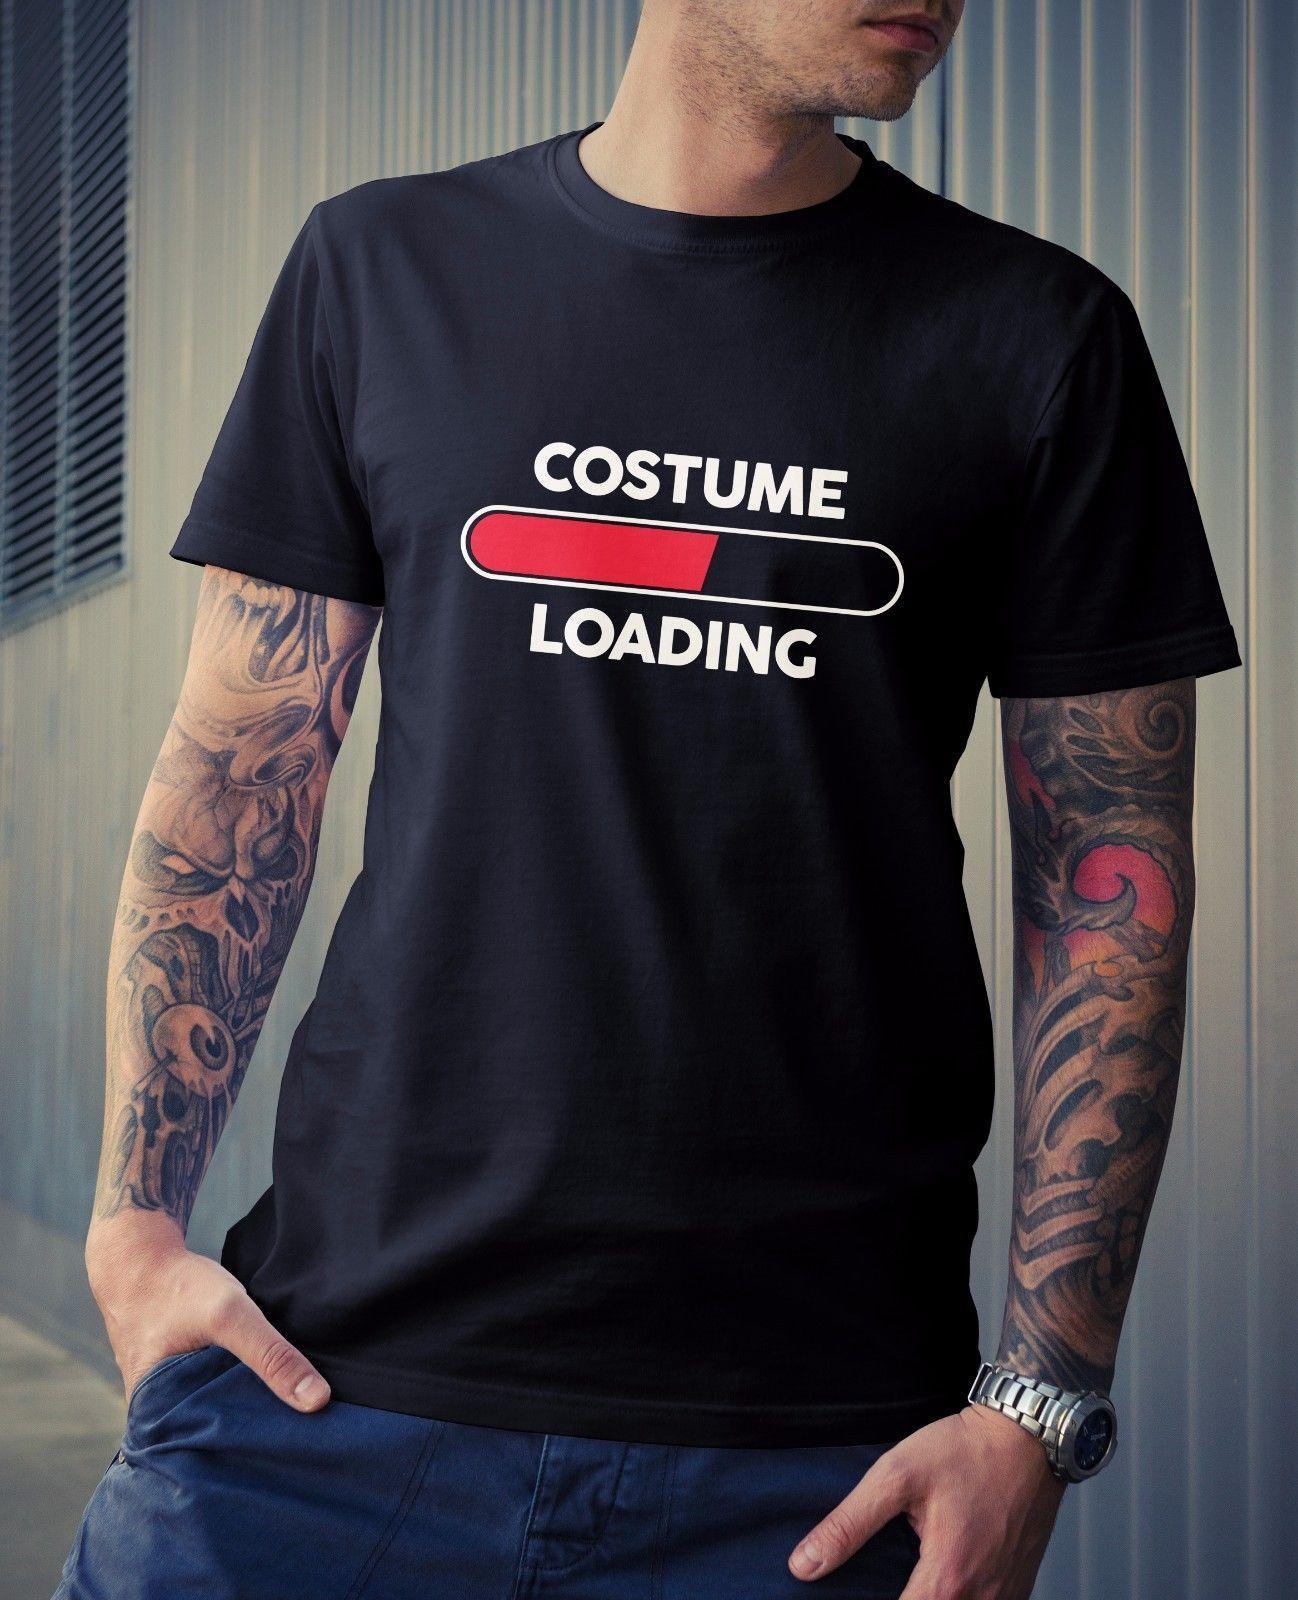 4a8ef562d Costume Loading Men's & Kids T-Shirt - Halloween Novelty Joke Funny Party  Fancy Cool Casual pride t shirt men Unisex New